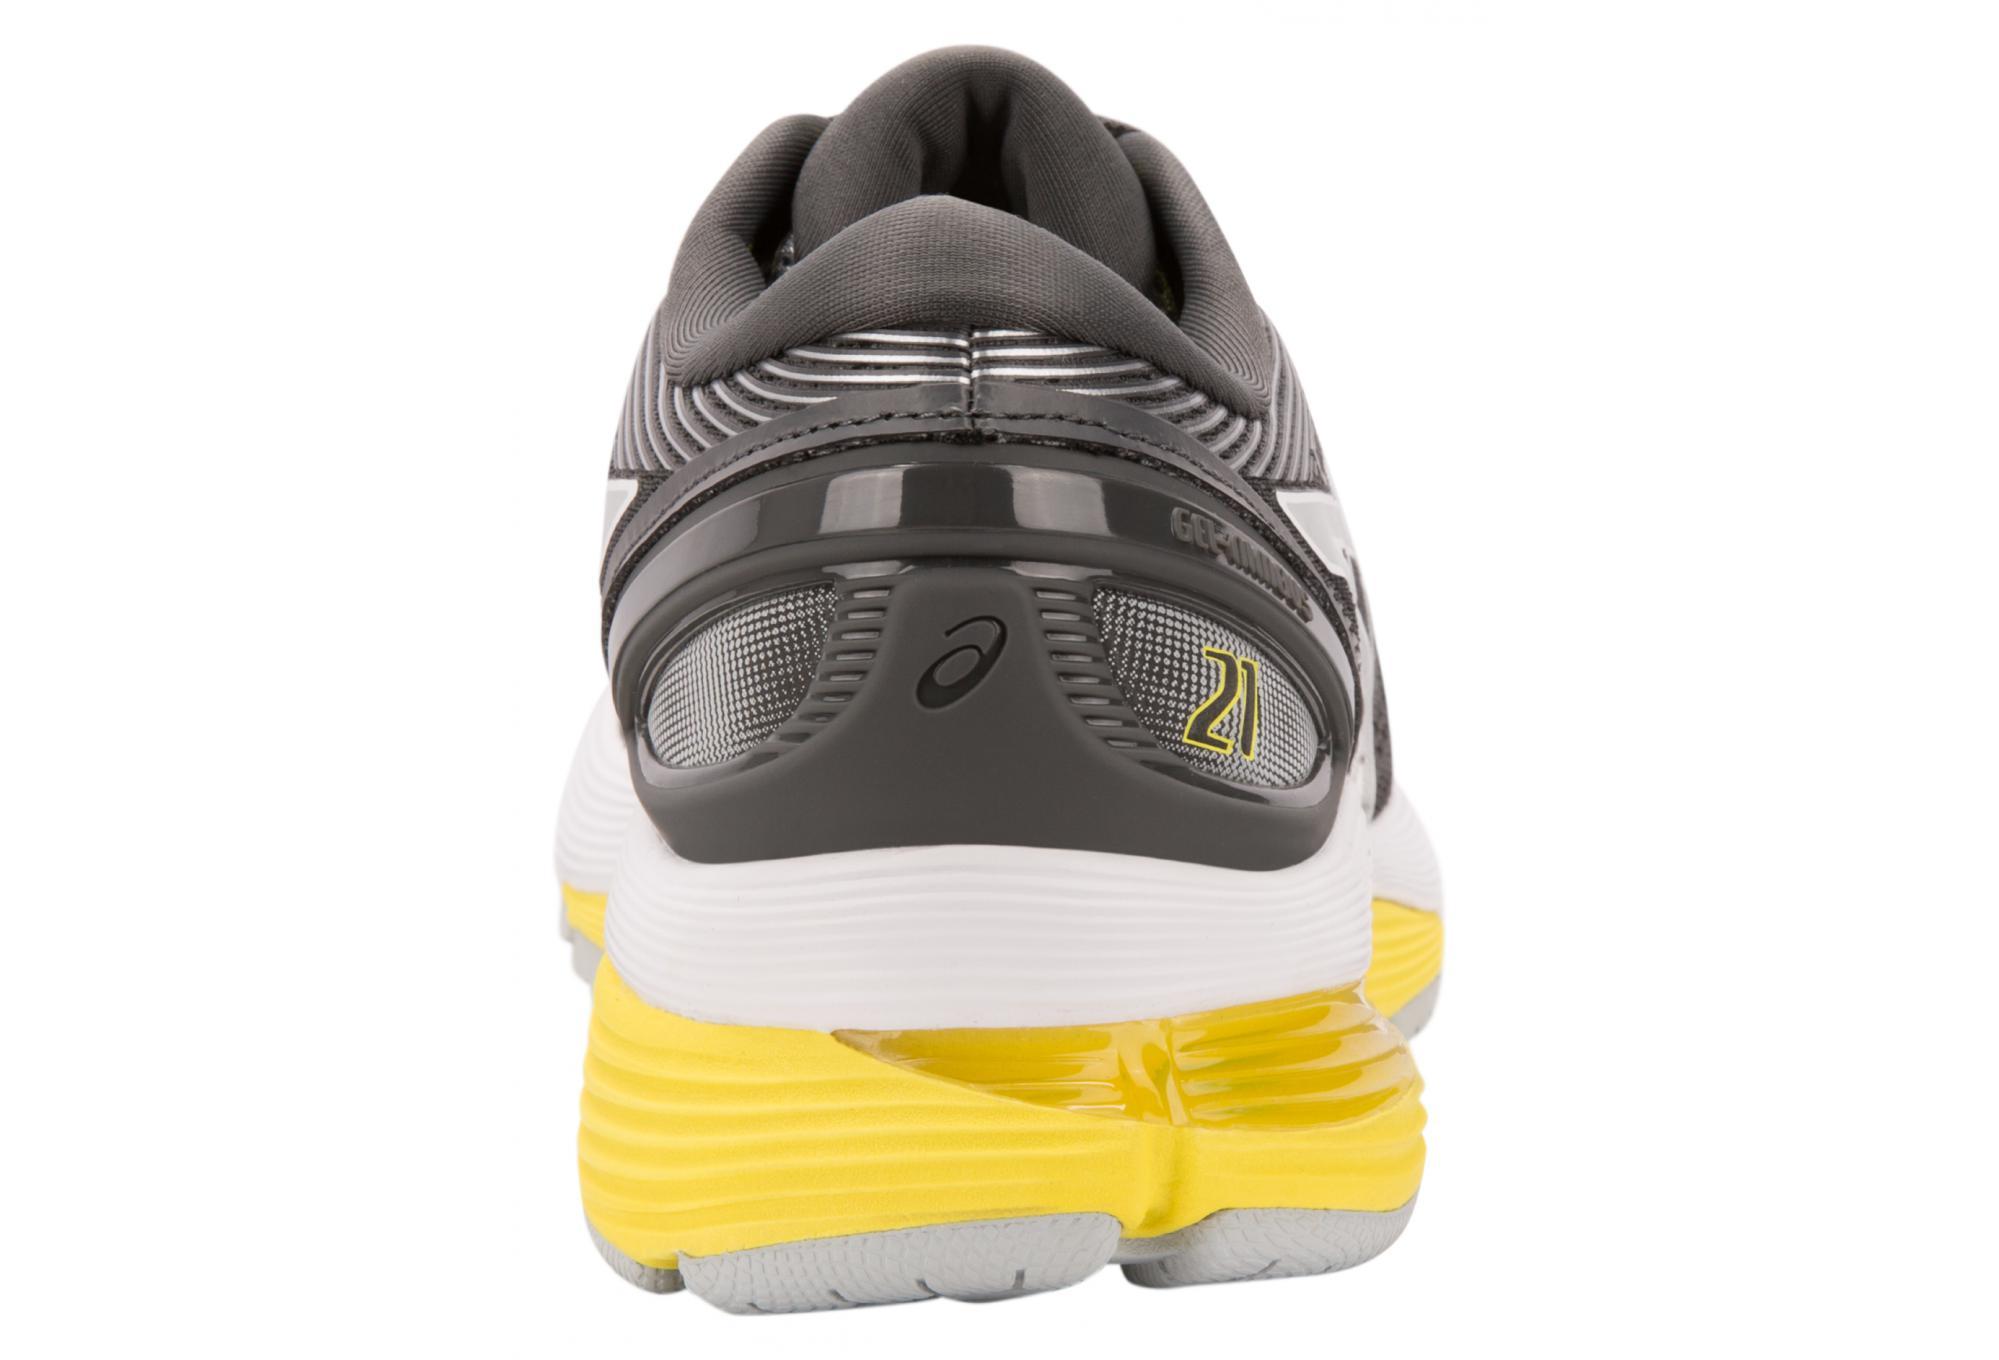 Asics Shoes Run Gel Nimbus 21 Grey Yellow Women 42